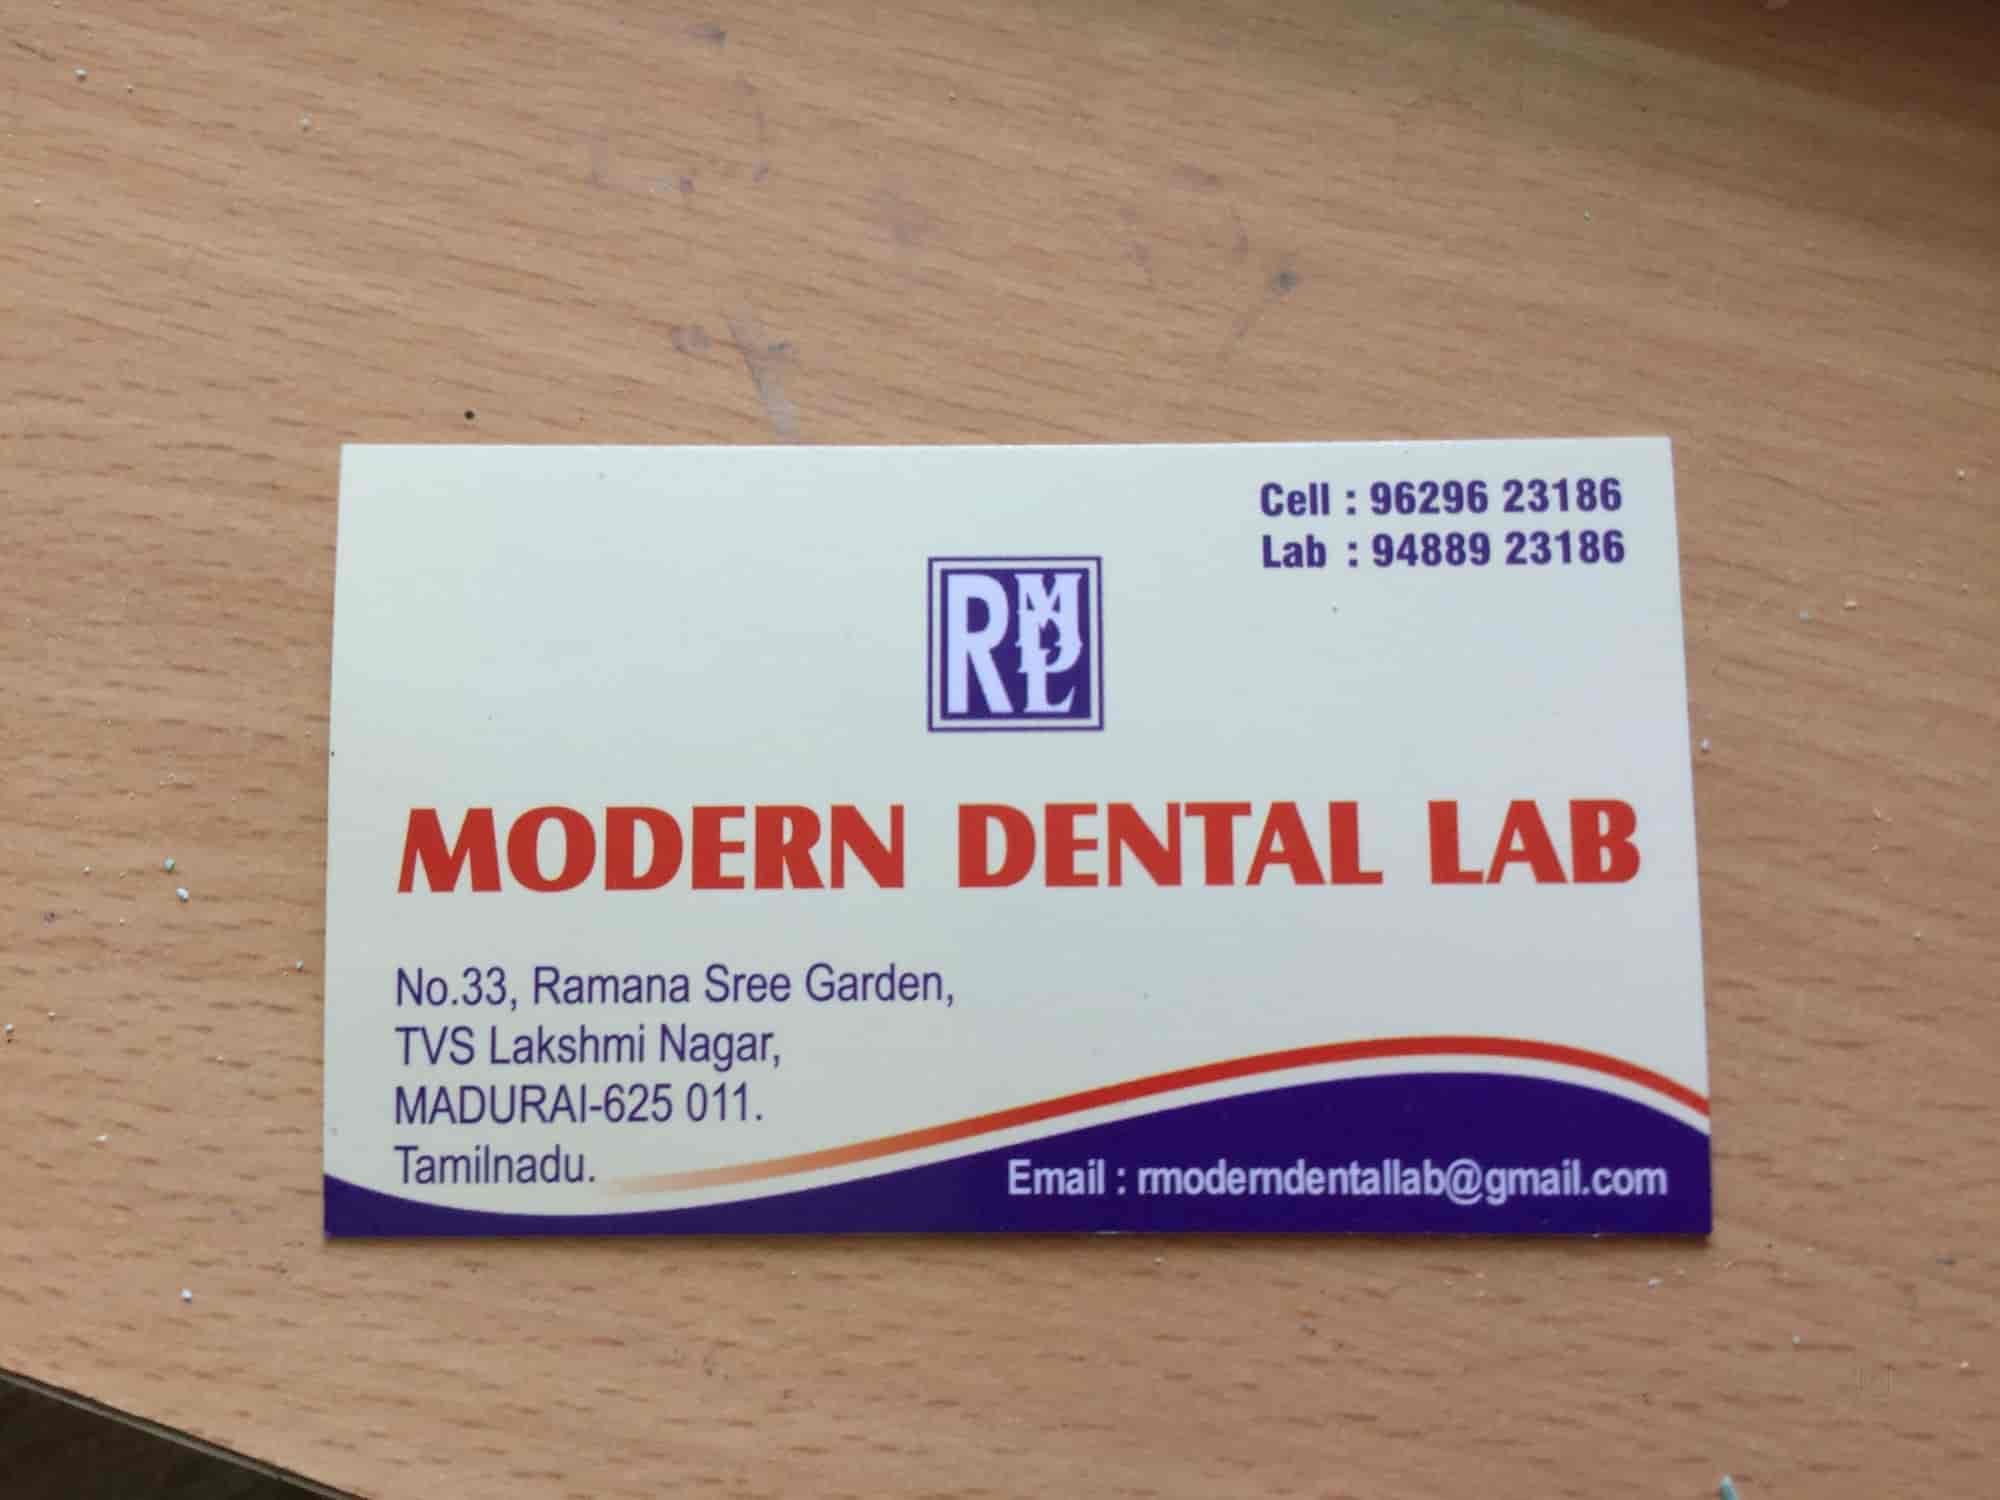 Modern Dental Lab Photos, TVS Nagar, Madurai- Pictures